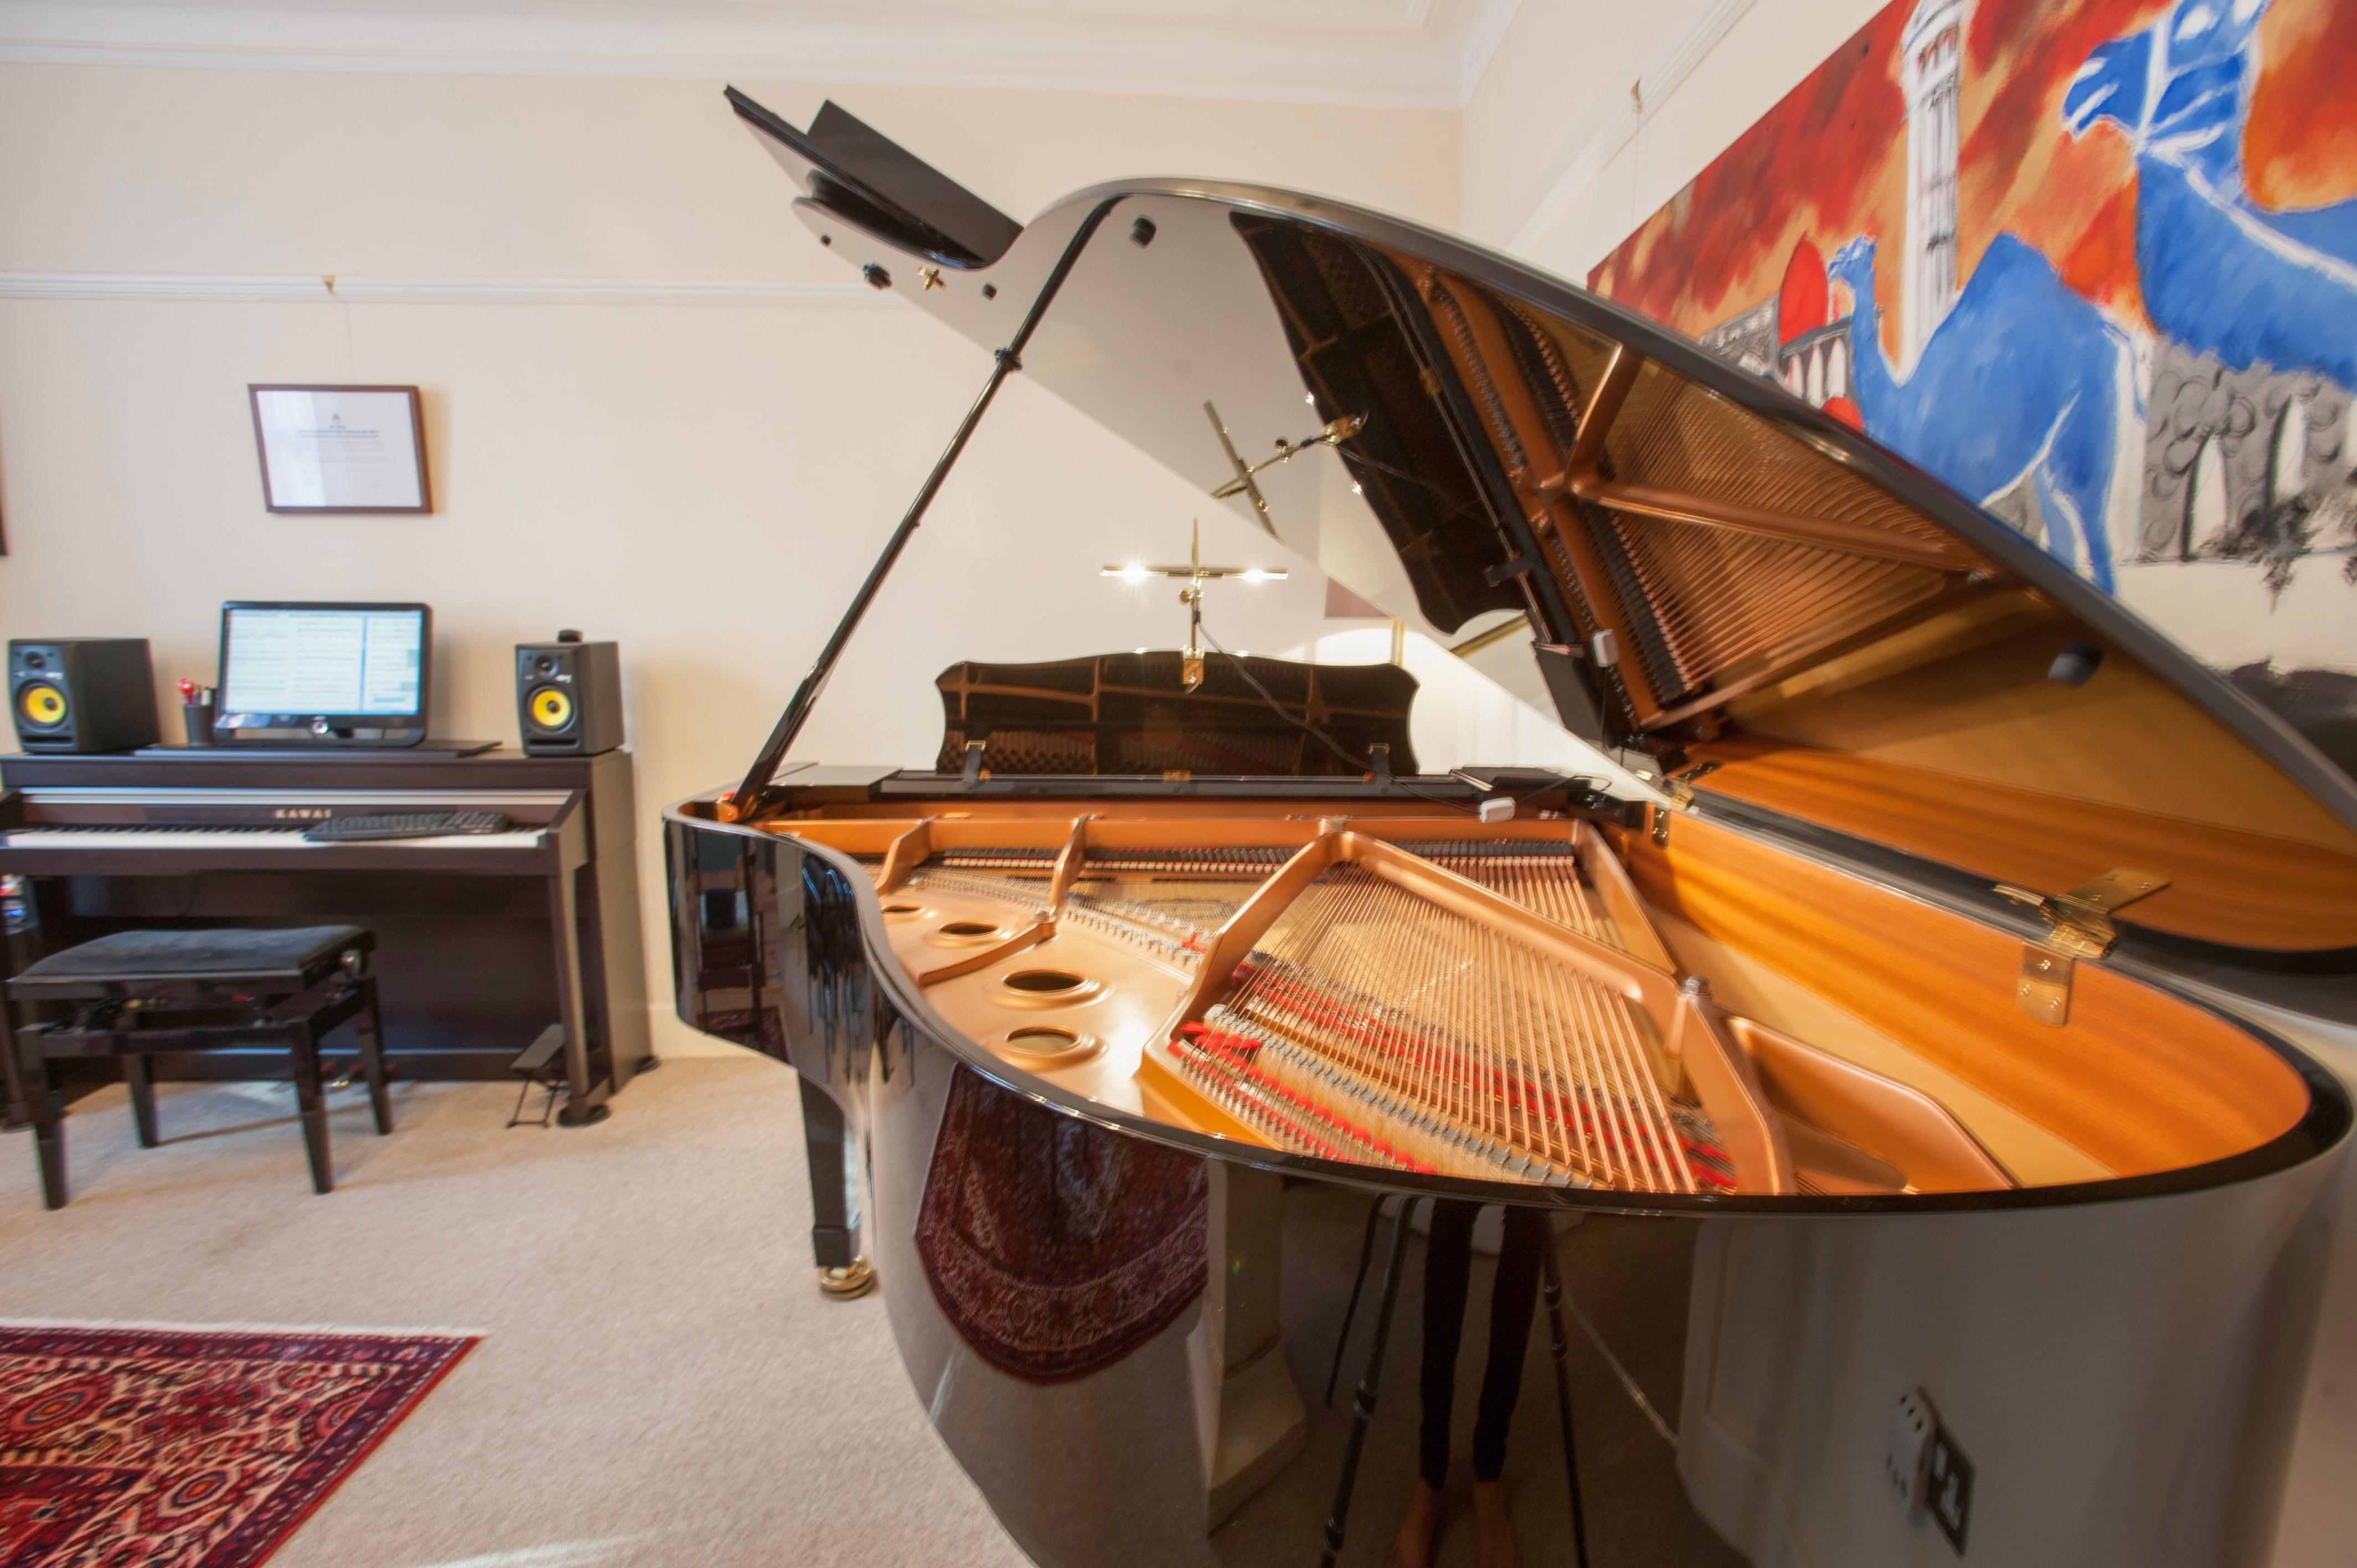 We use the same piano tuning!